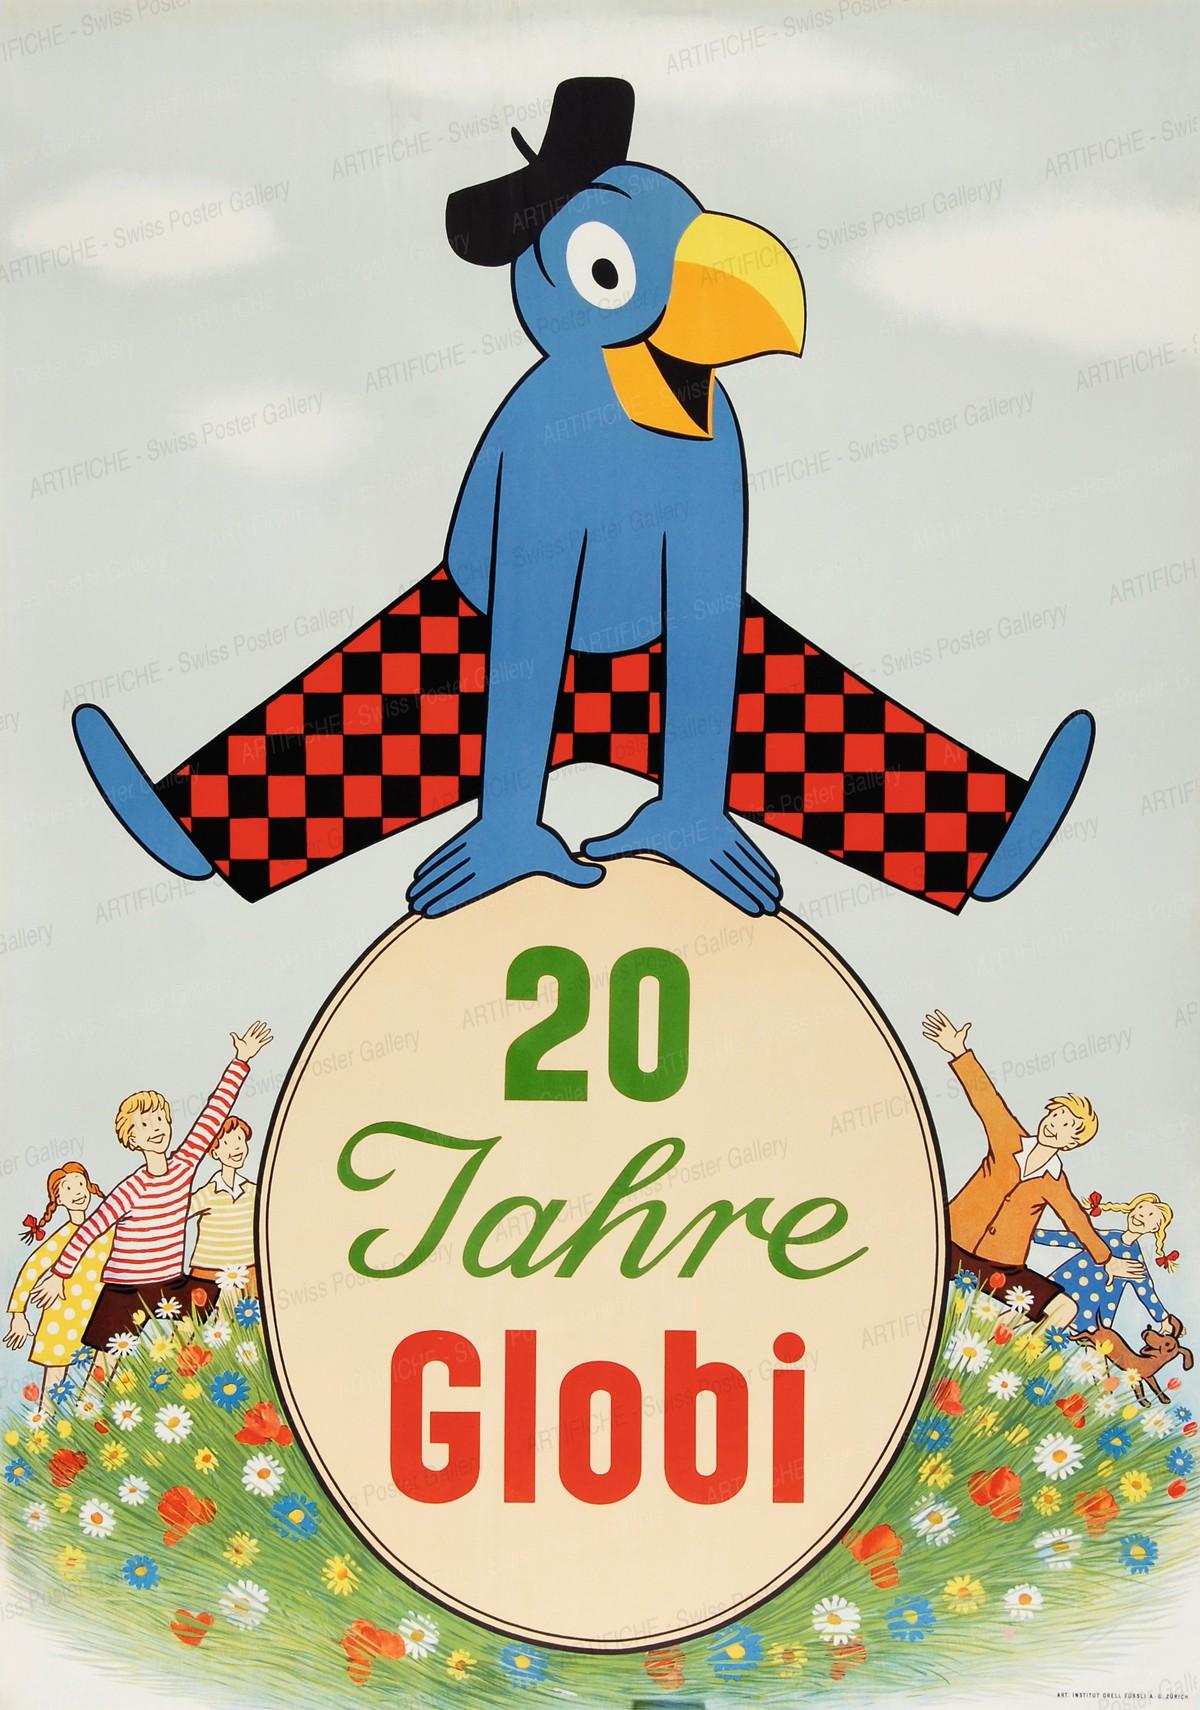 20 Years of Globus Department Store, Robert Lips